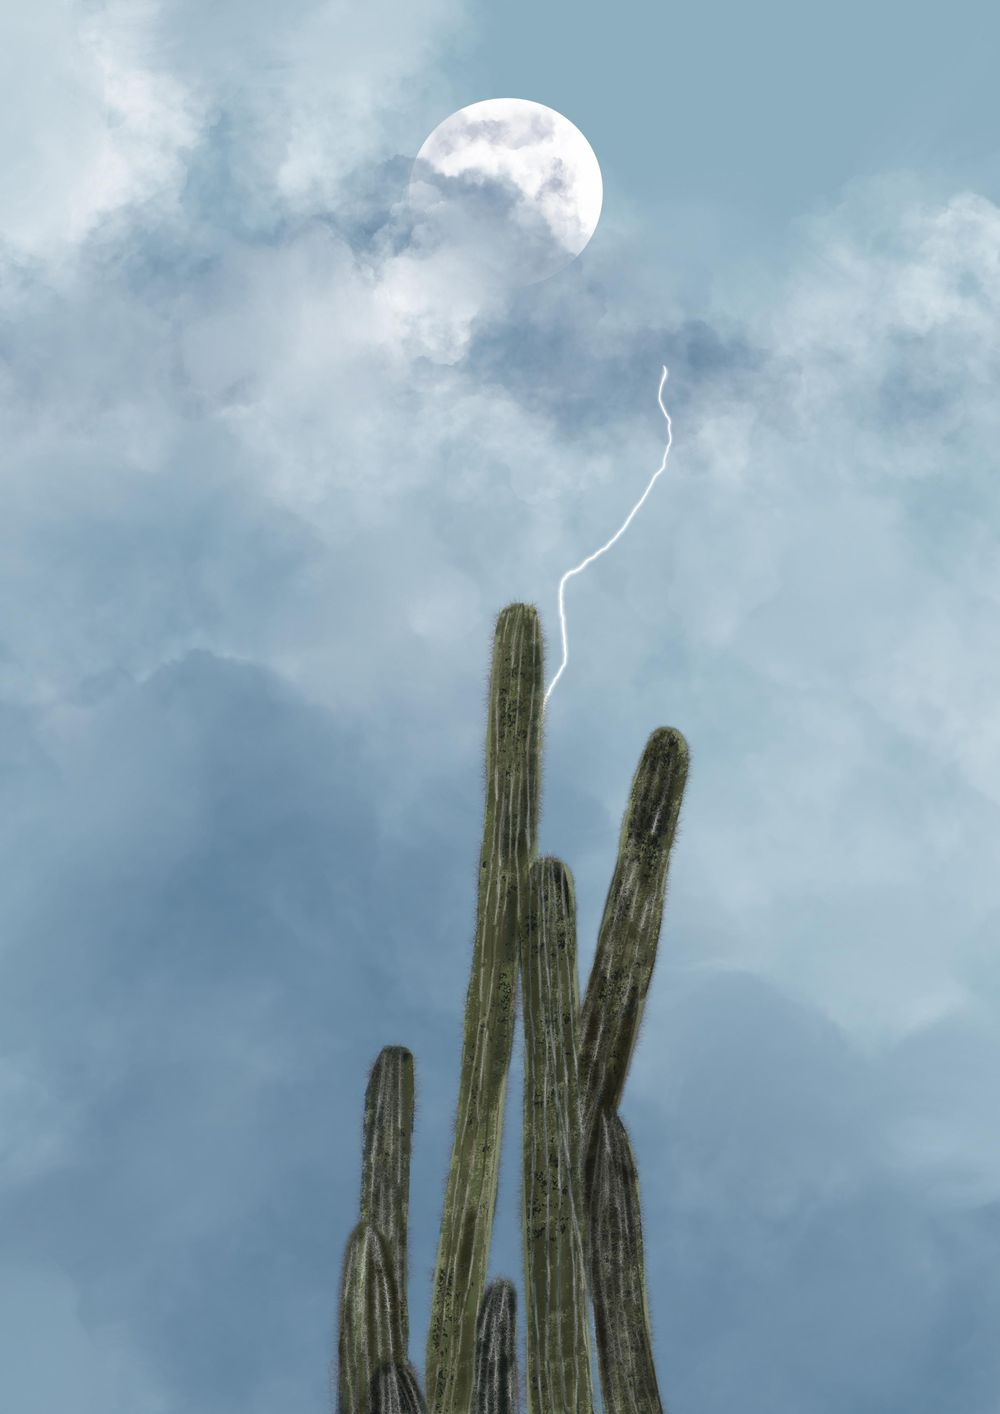 Desert Cactus - image 3 - student project